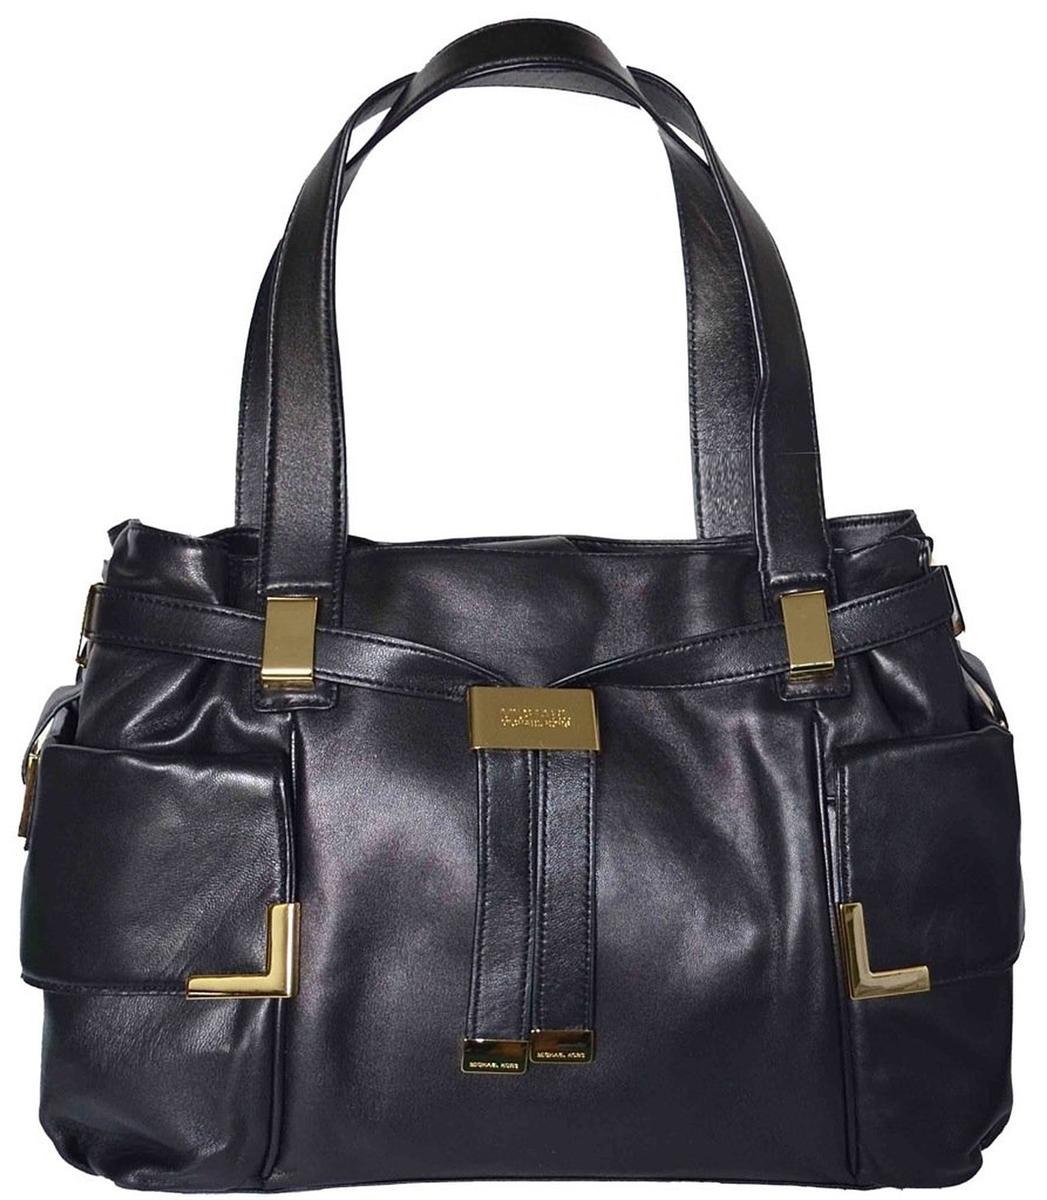 26695f2f97fc66 Michael Kors Beverly Large Leather Drawstring Satchel, Black